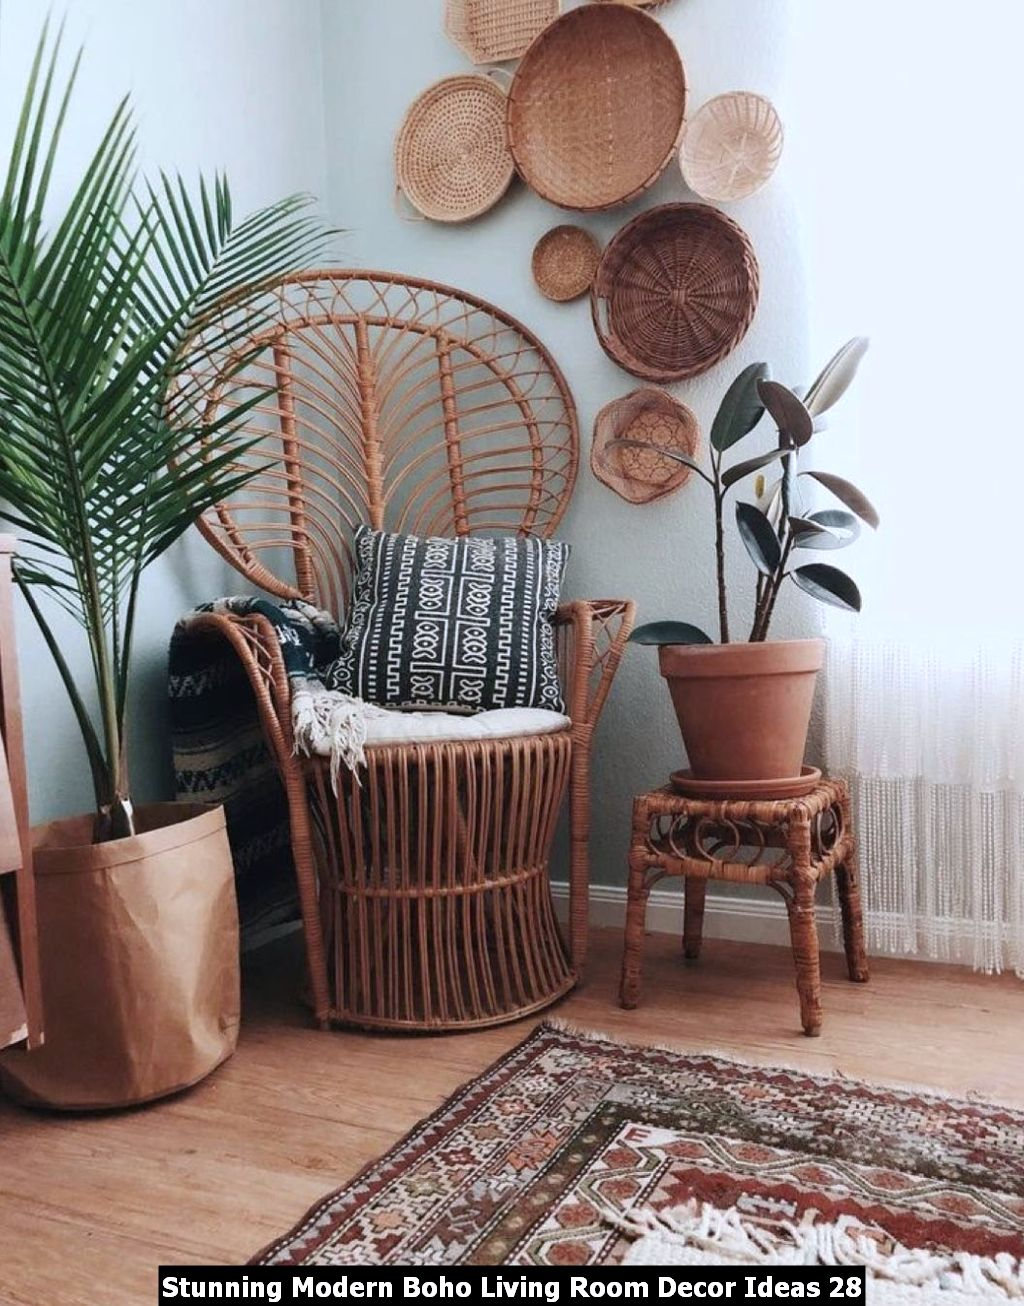 Stunning Modern Boho Living Room Decor Ideas 28